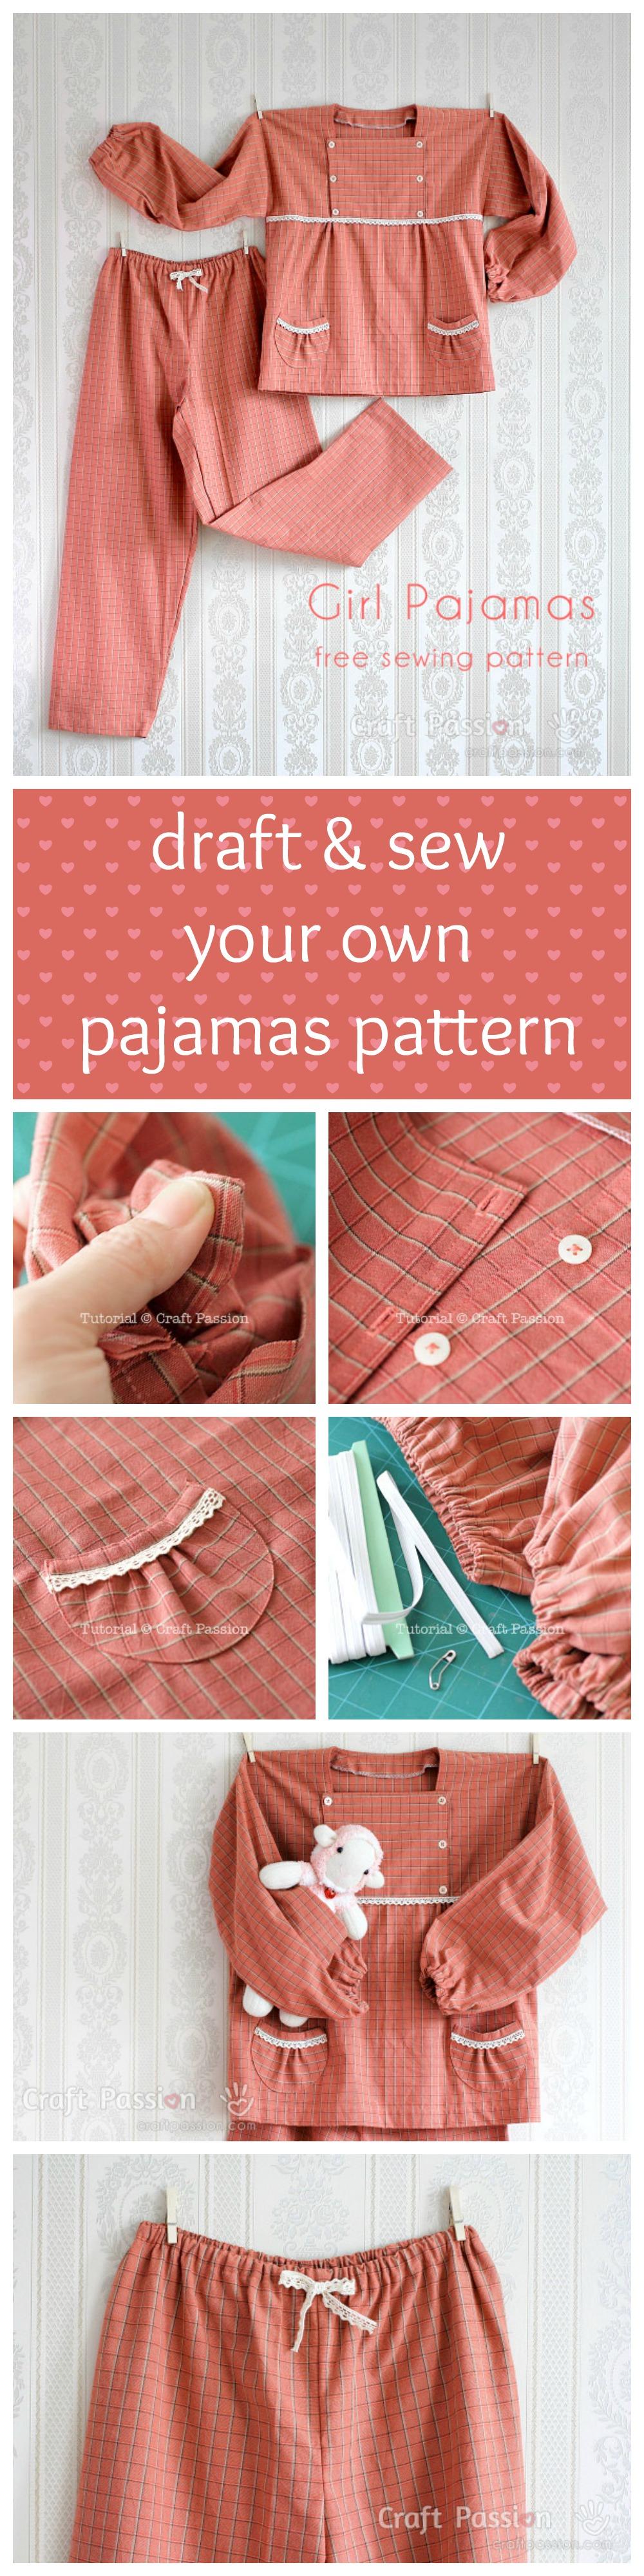 Girl Pajamas - 5 to 12 years old - Free Sewing Pattern | Costura